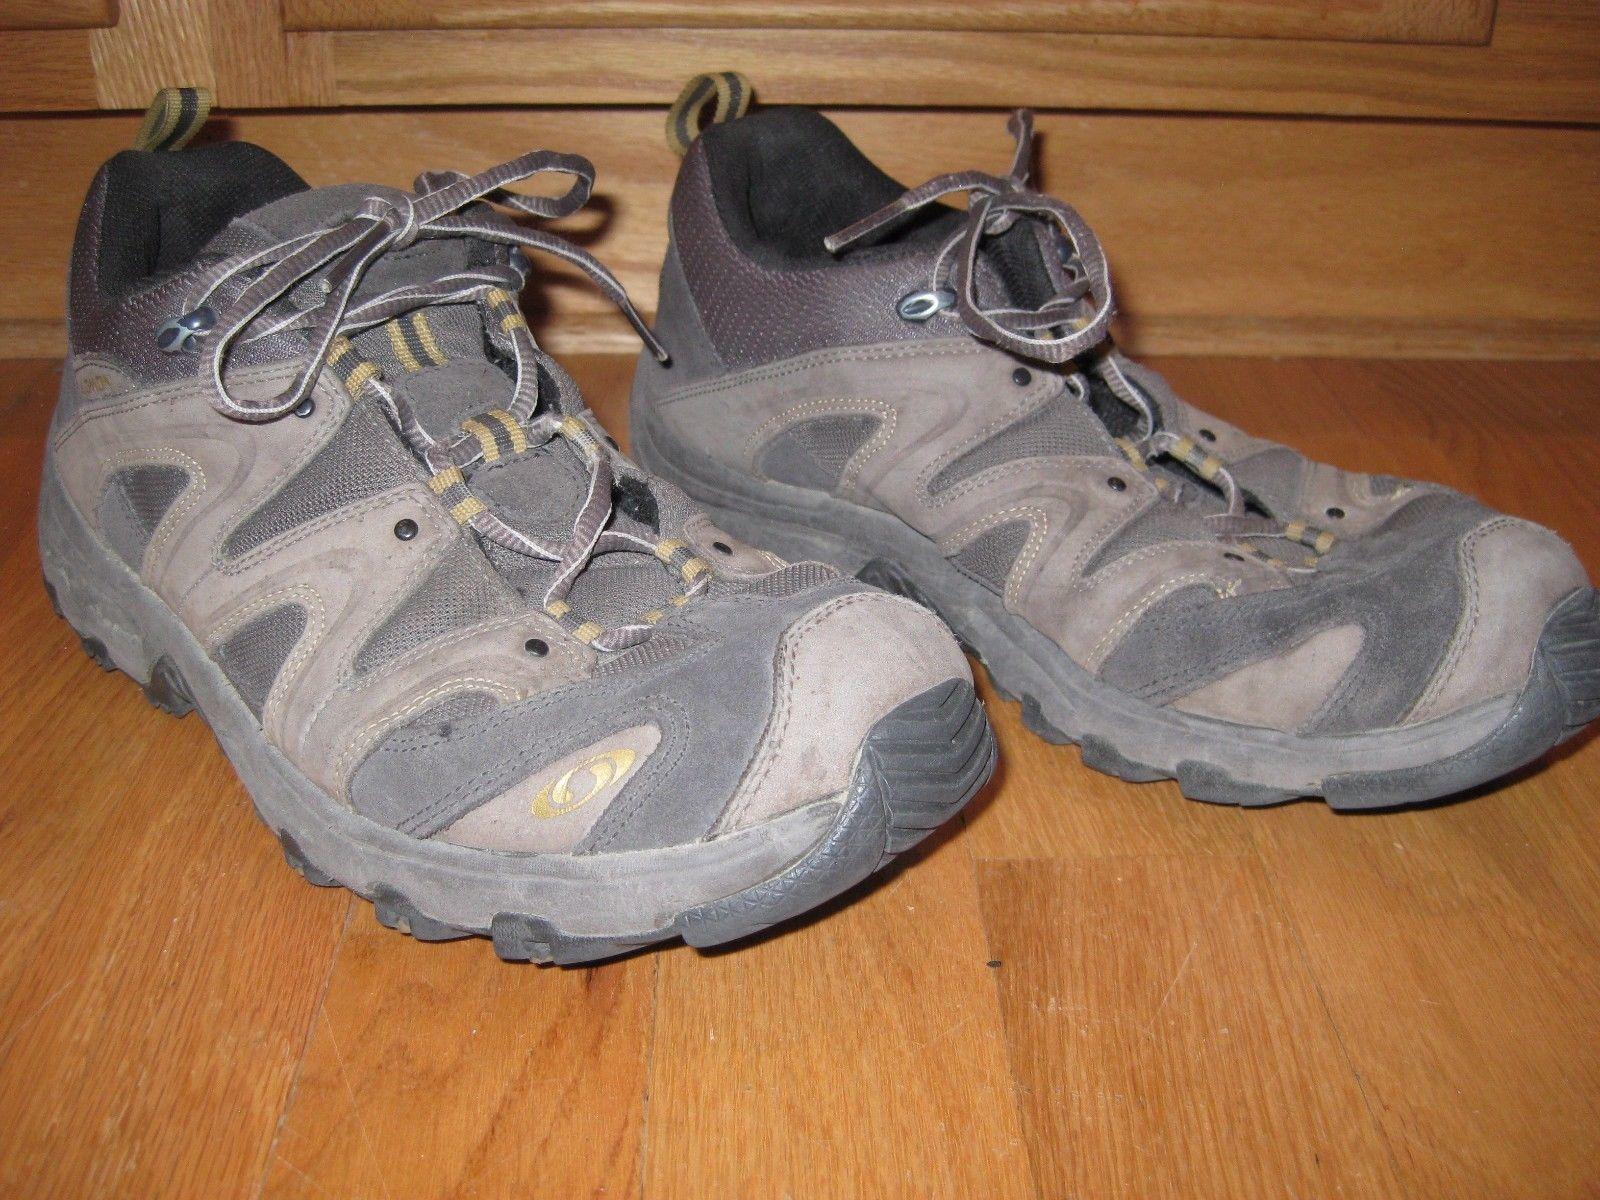 5607e3a7135e Salomon hiking trail shoes